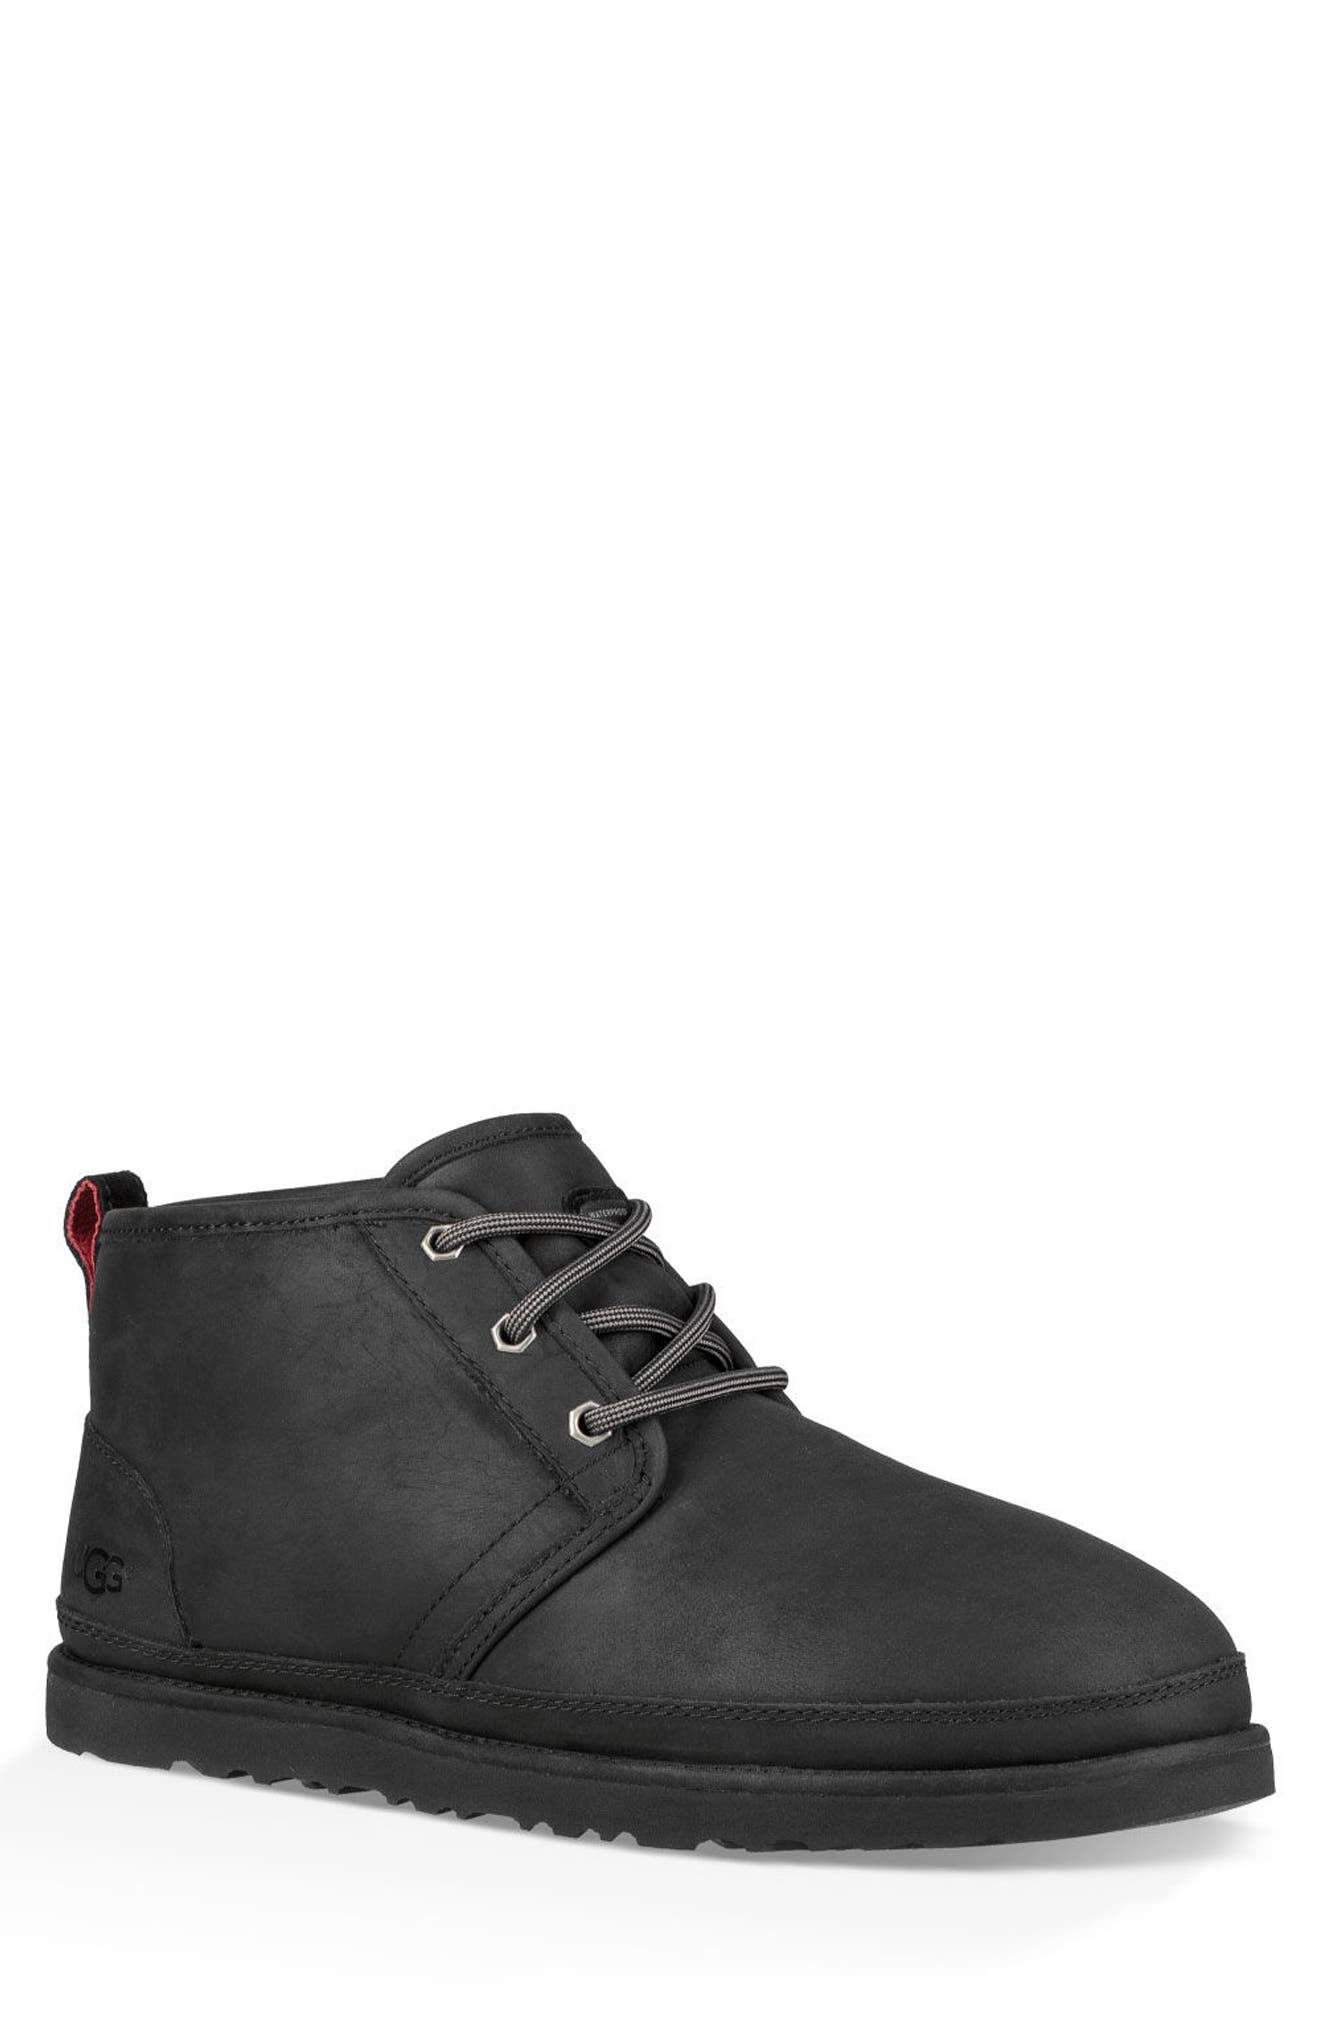 UGG<SUP>®</SUP> Neumel Waterproof Chukka Boot, Main, color, BLACK